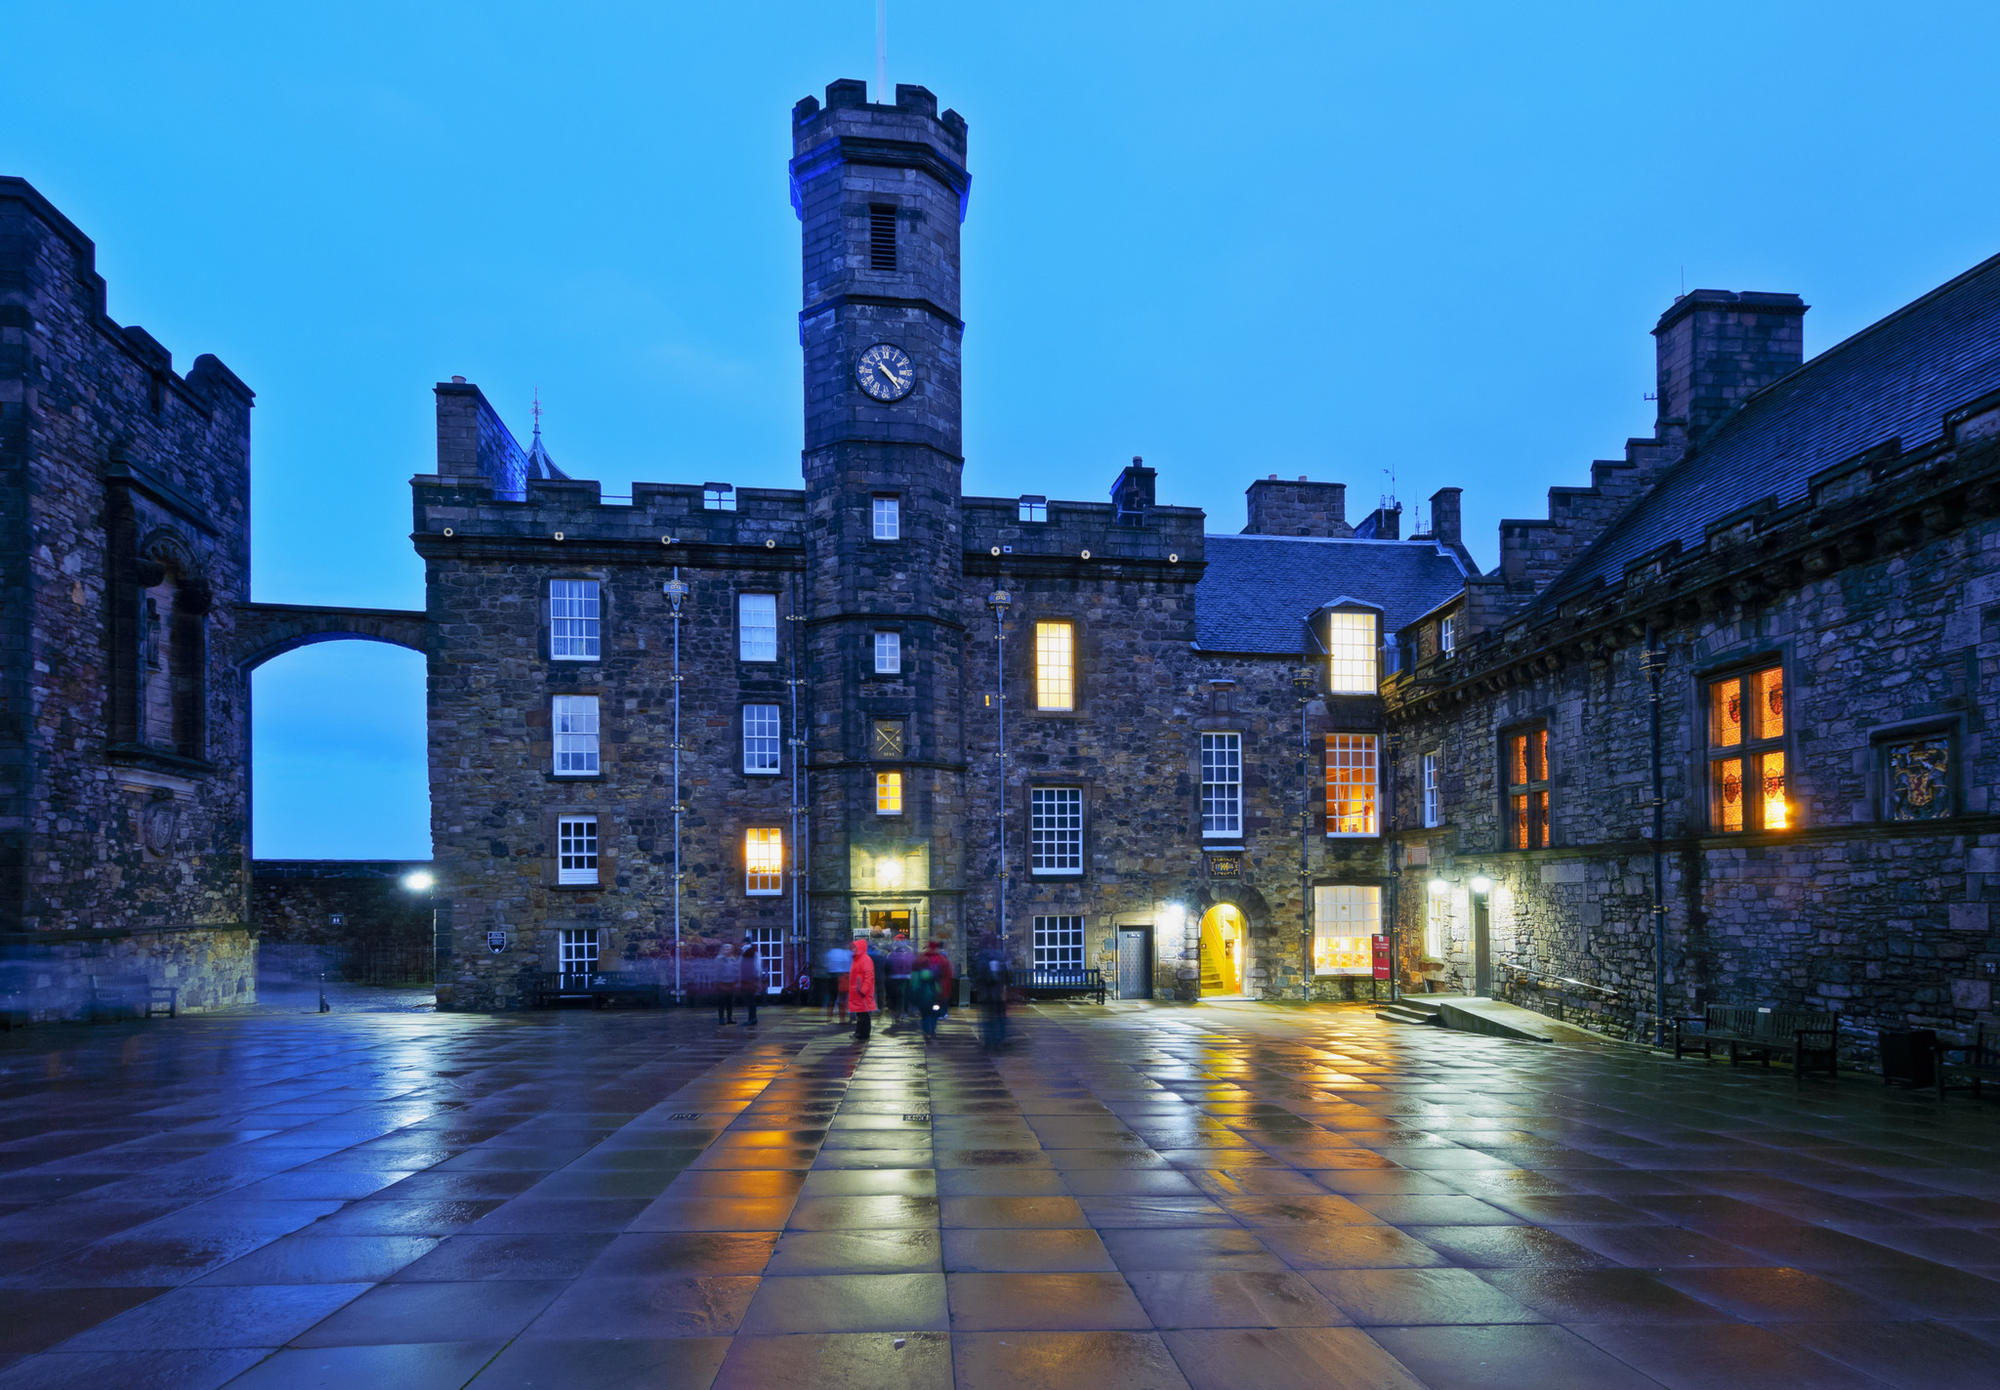 Edinburgh Castle, The Royal Palace.